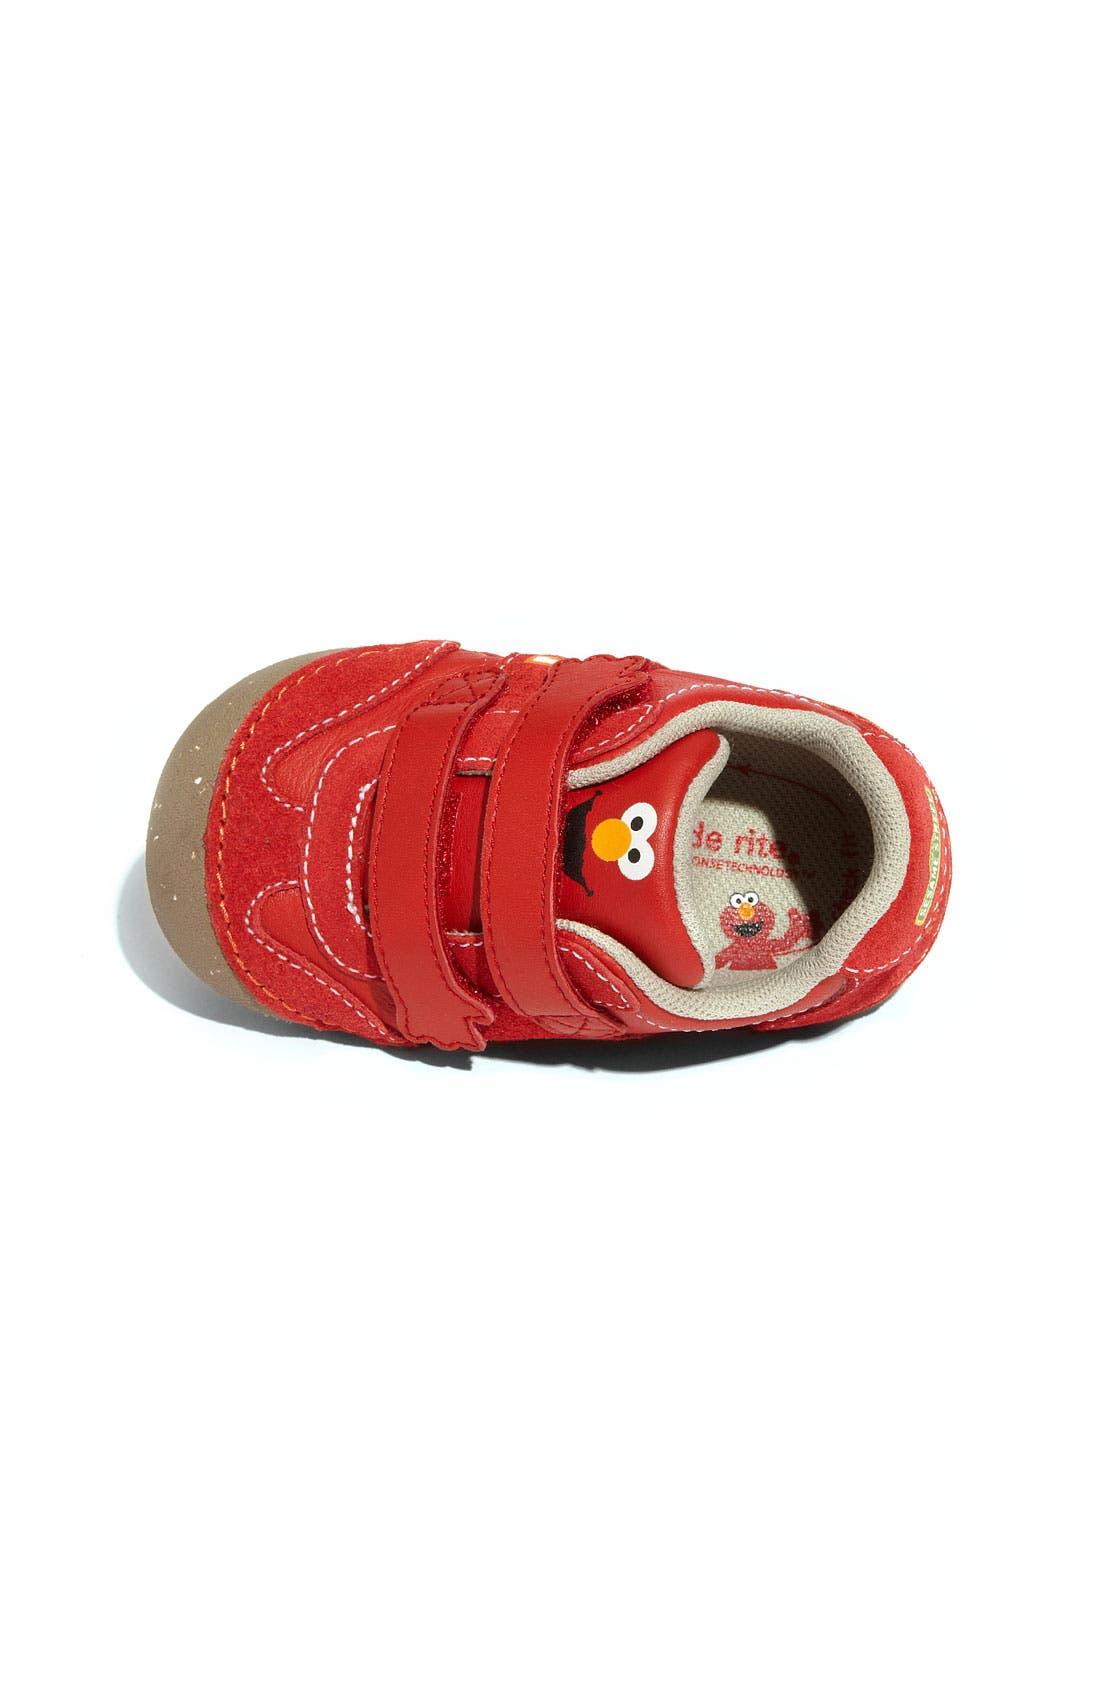 'Sesame Street<sup>®</sup> - Elmo' Sneaker,                             Alternate thumbnail 3, color,                             600